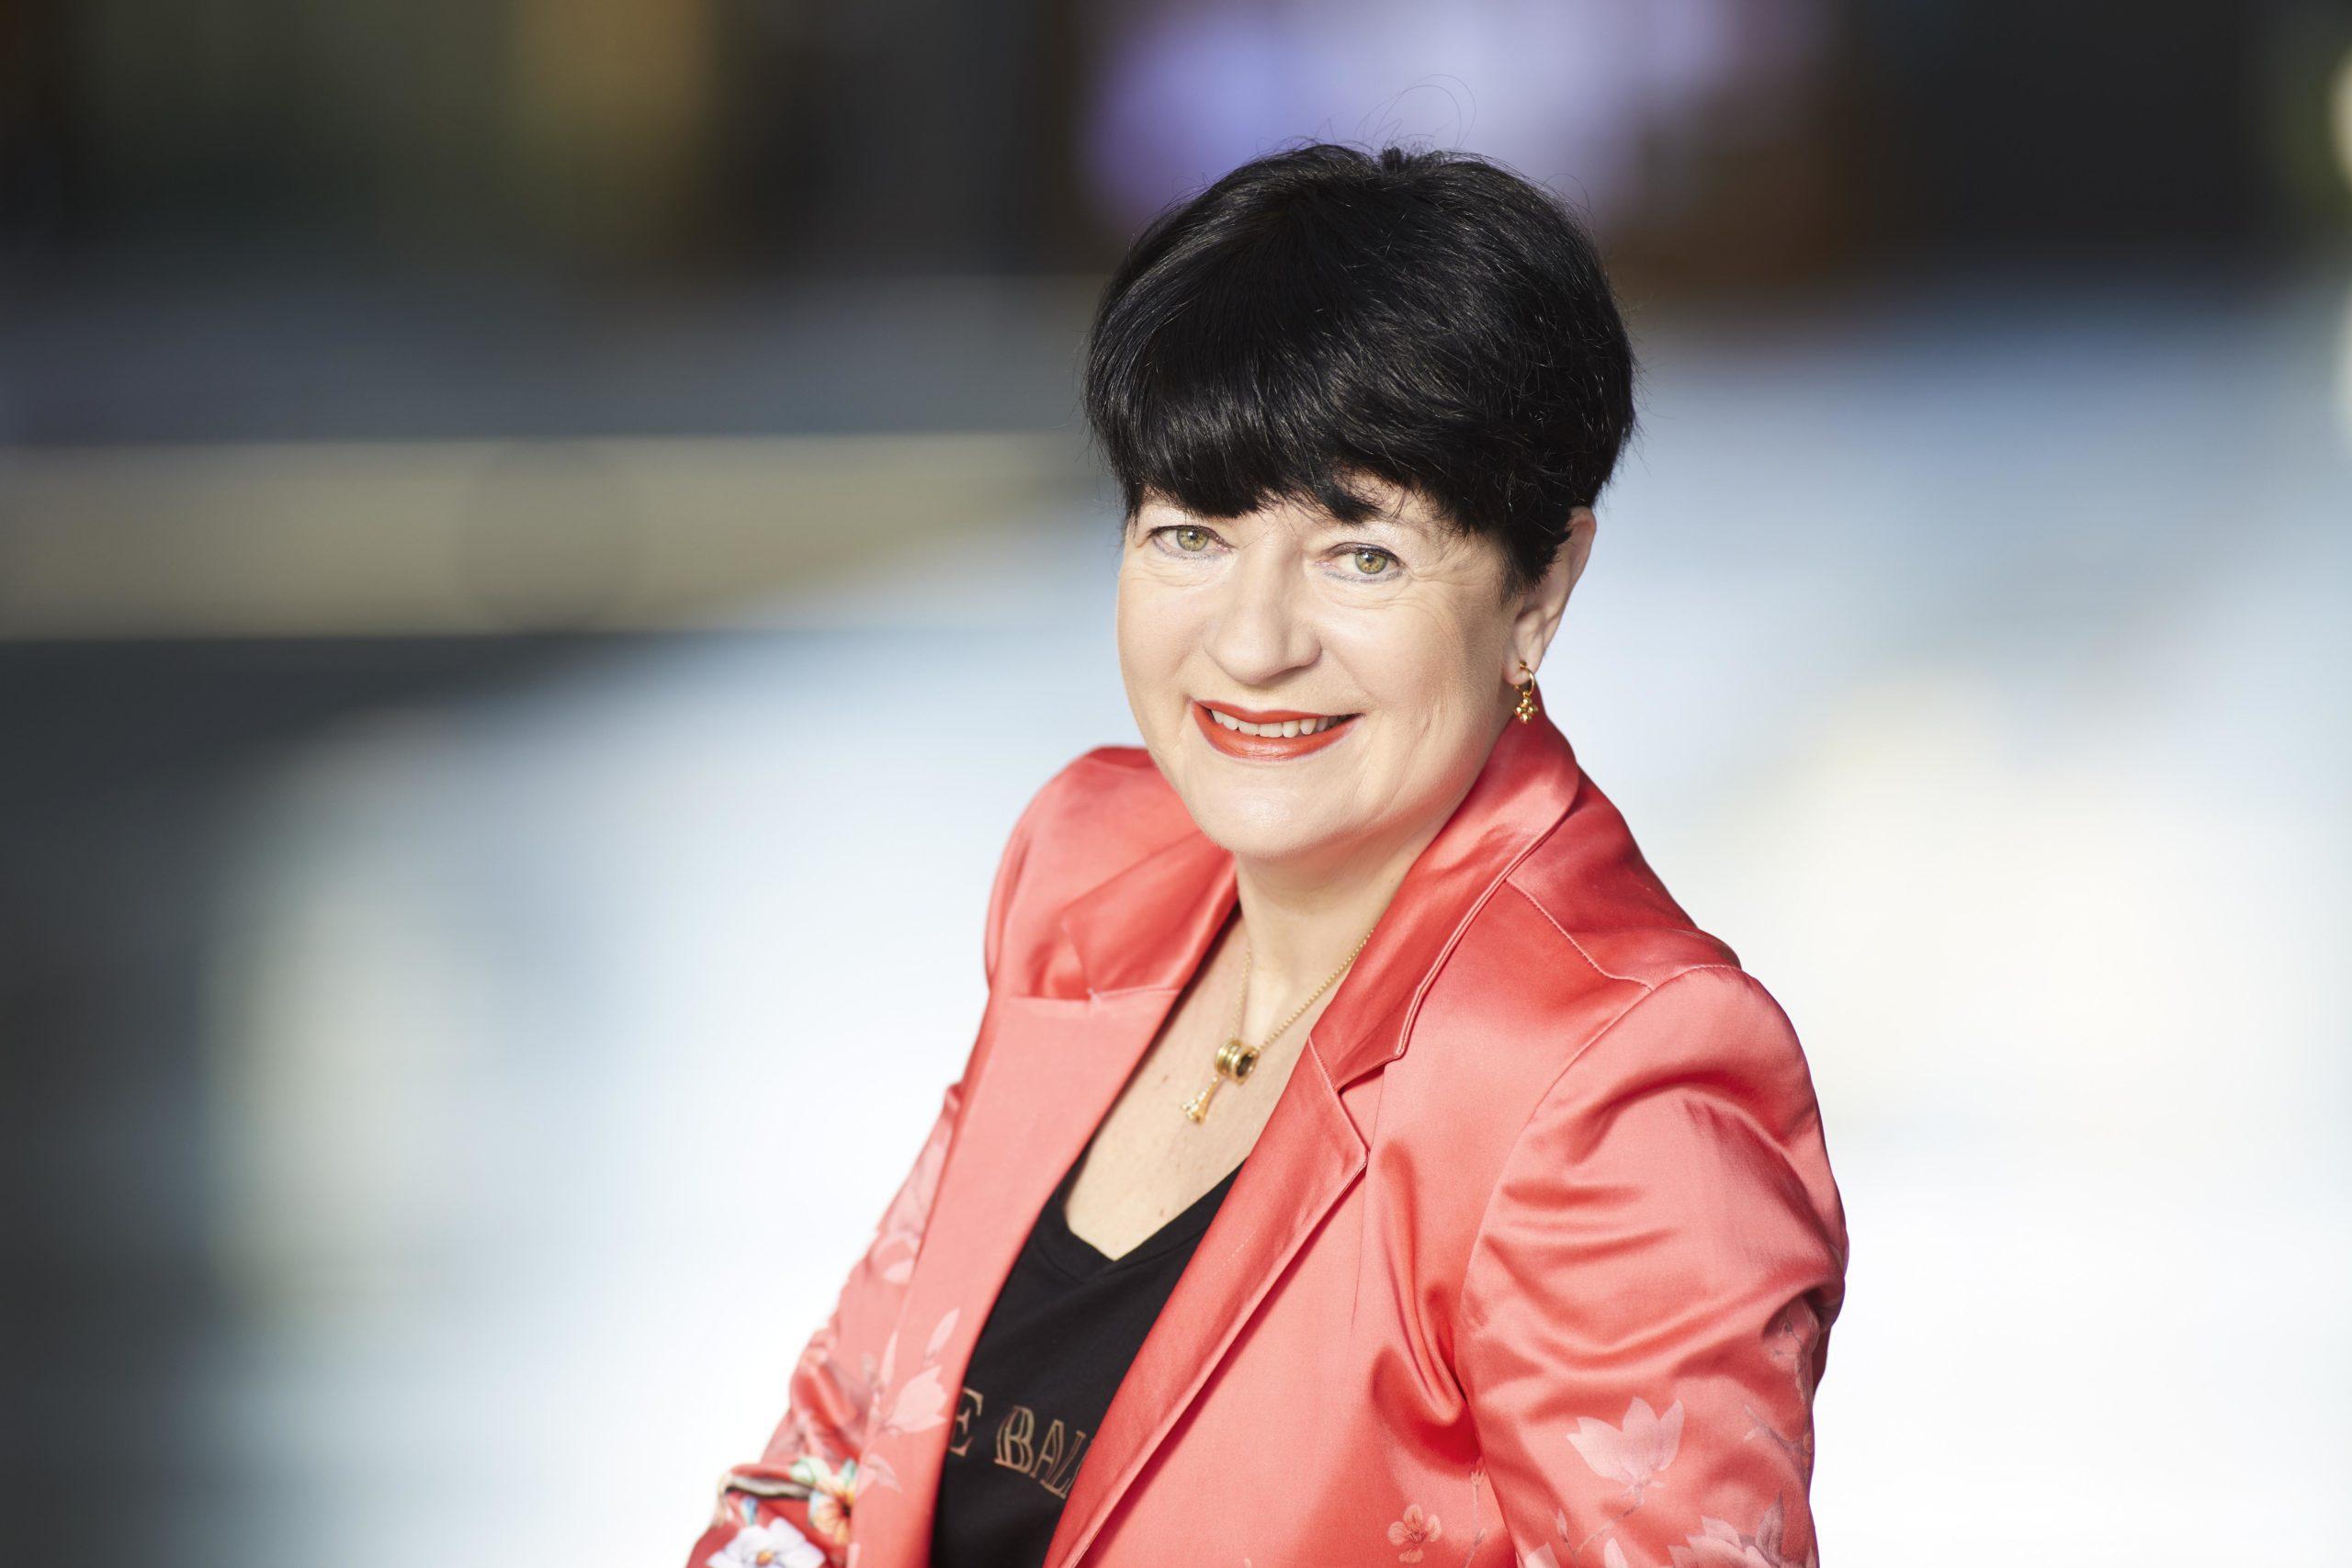 Christine Aschenberg-Dugnus